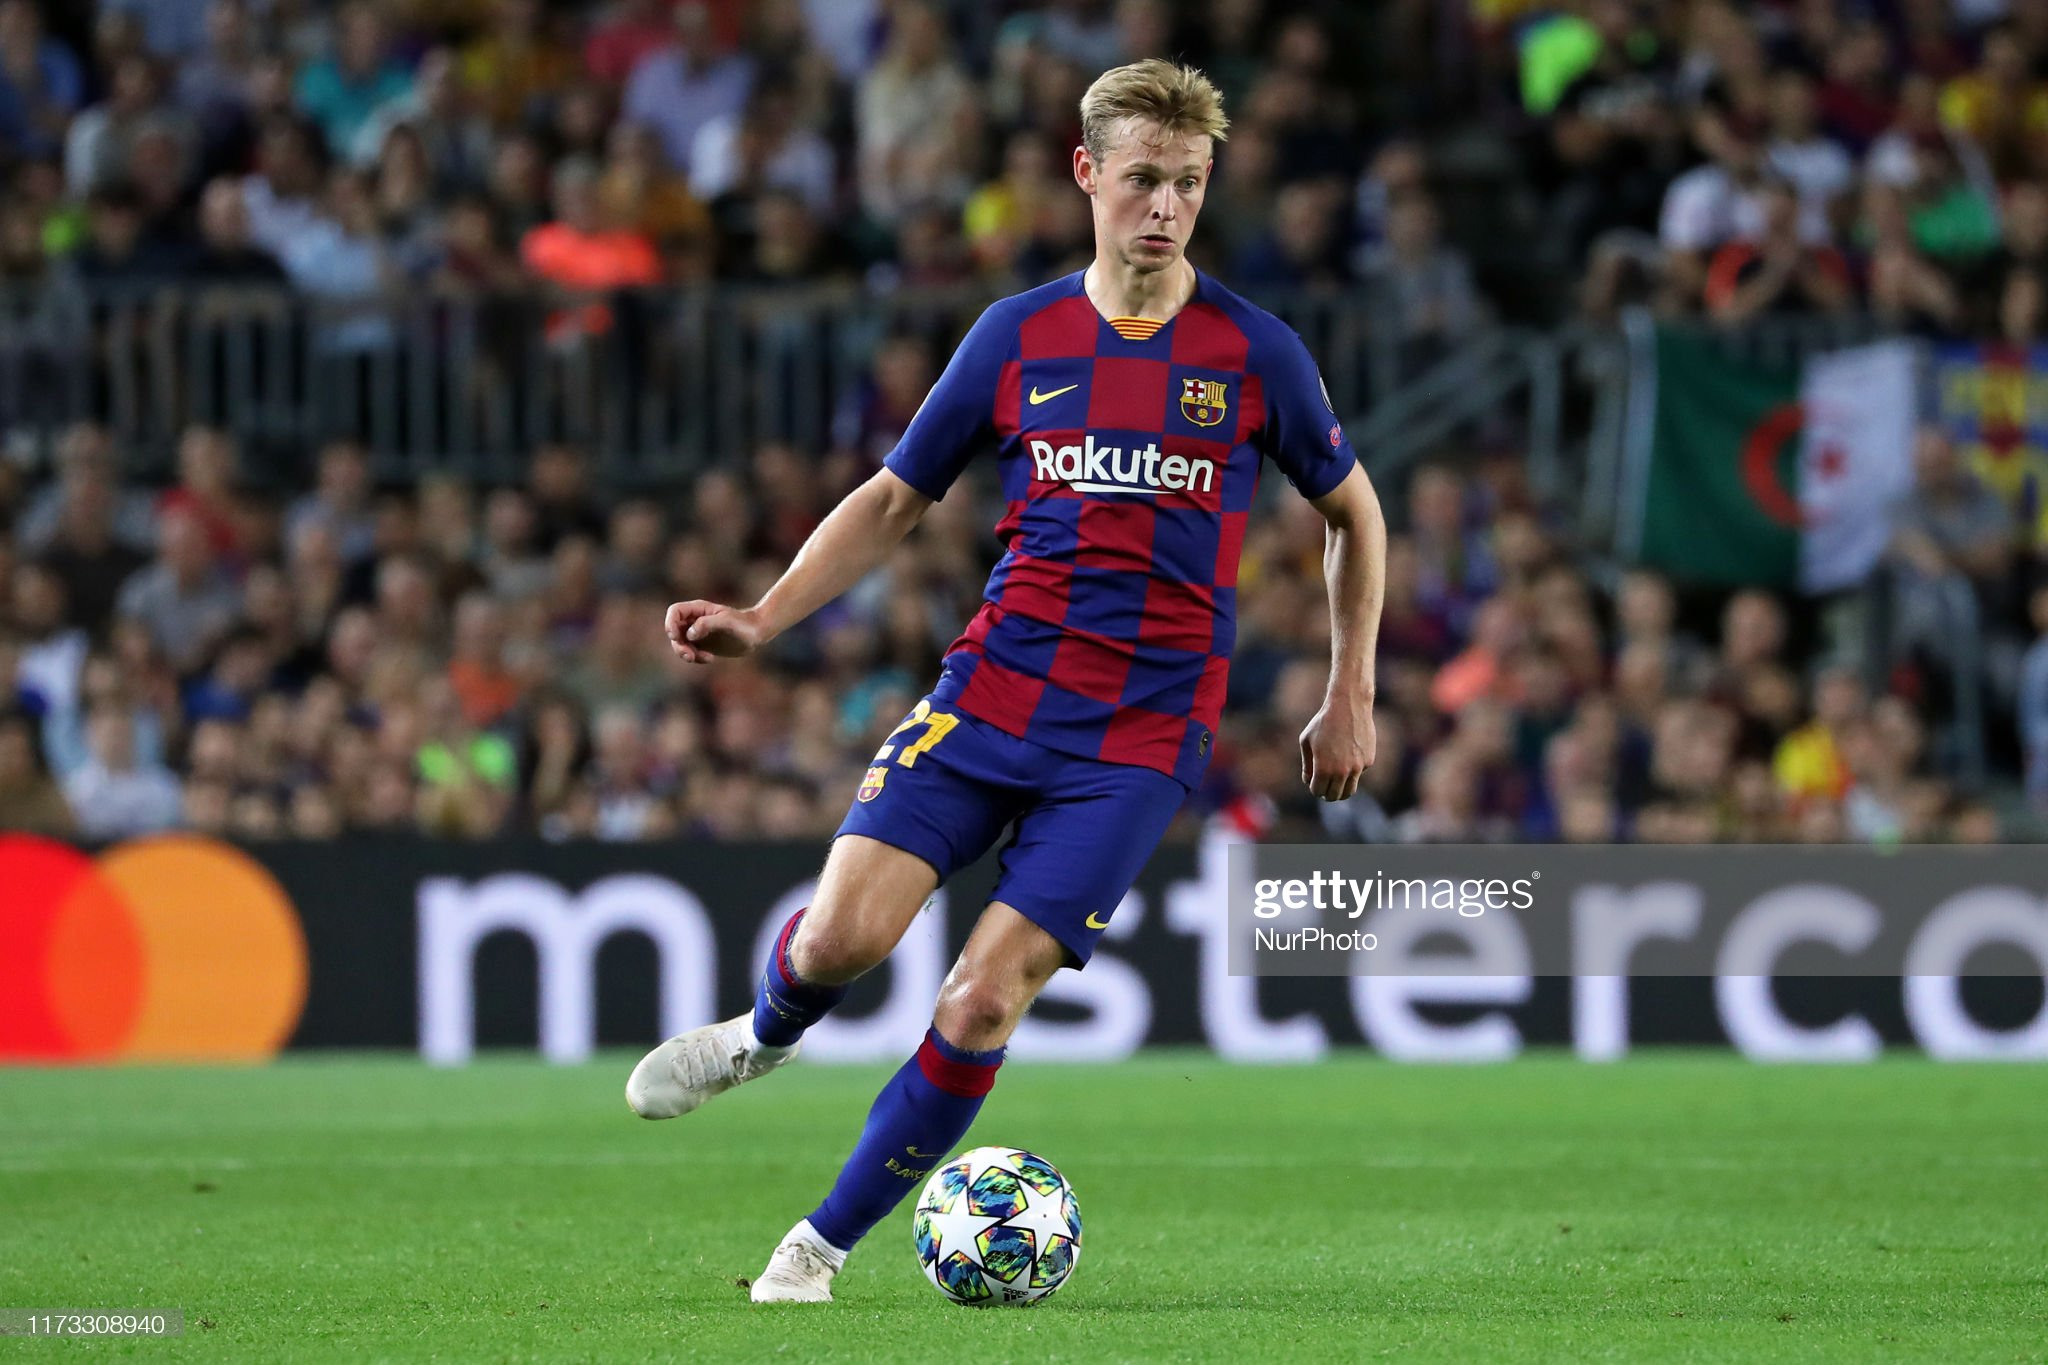 صور مباراة : برشلونة - إنتر 2-1 ( 02-10-2019 )  Frenkie-de-jong-during-the-match-between-fc-barcelona-between-inter-picture-id1173308940?s=2048x2048